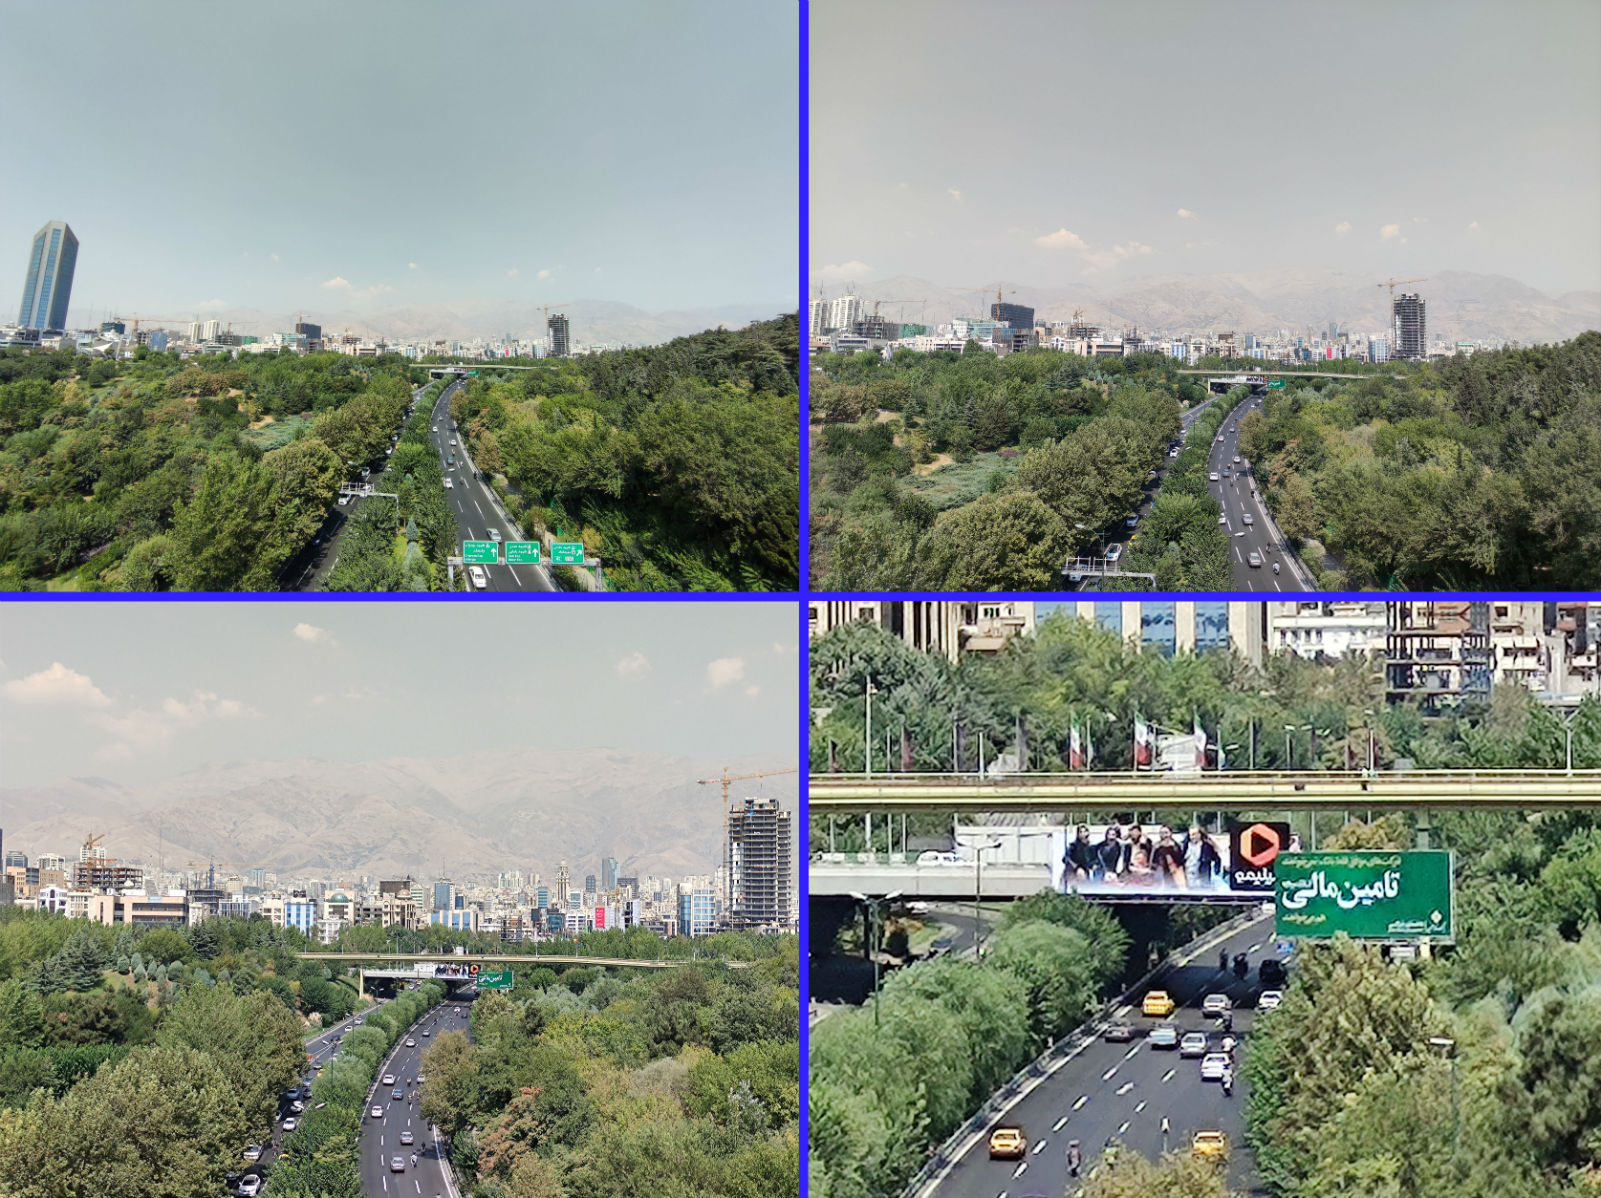 PocoF2Pro Camera Zoom w1600 بررسی شیائومی پوکو اف ۲ پرو ؛ کابوس پرچمداران ۱۰۰۰ دلاری اخبار IT